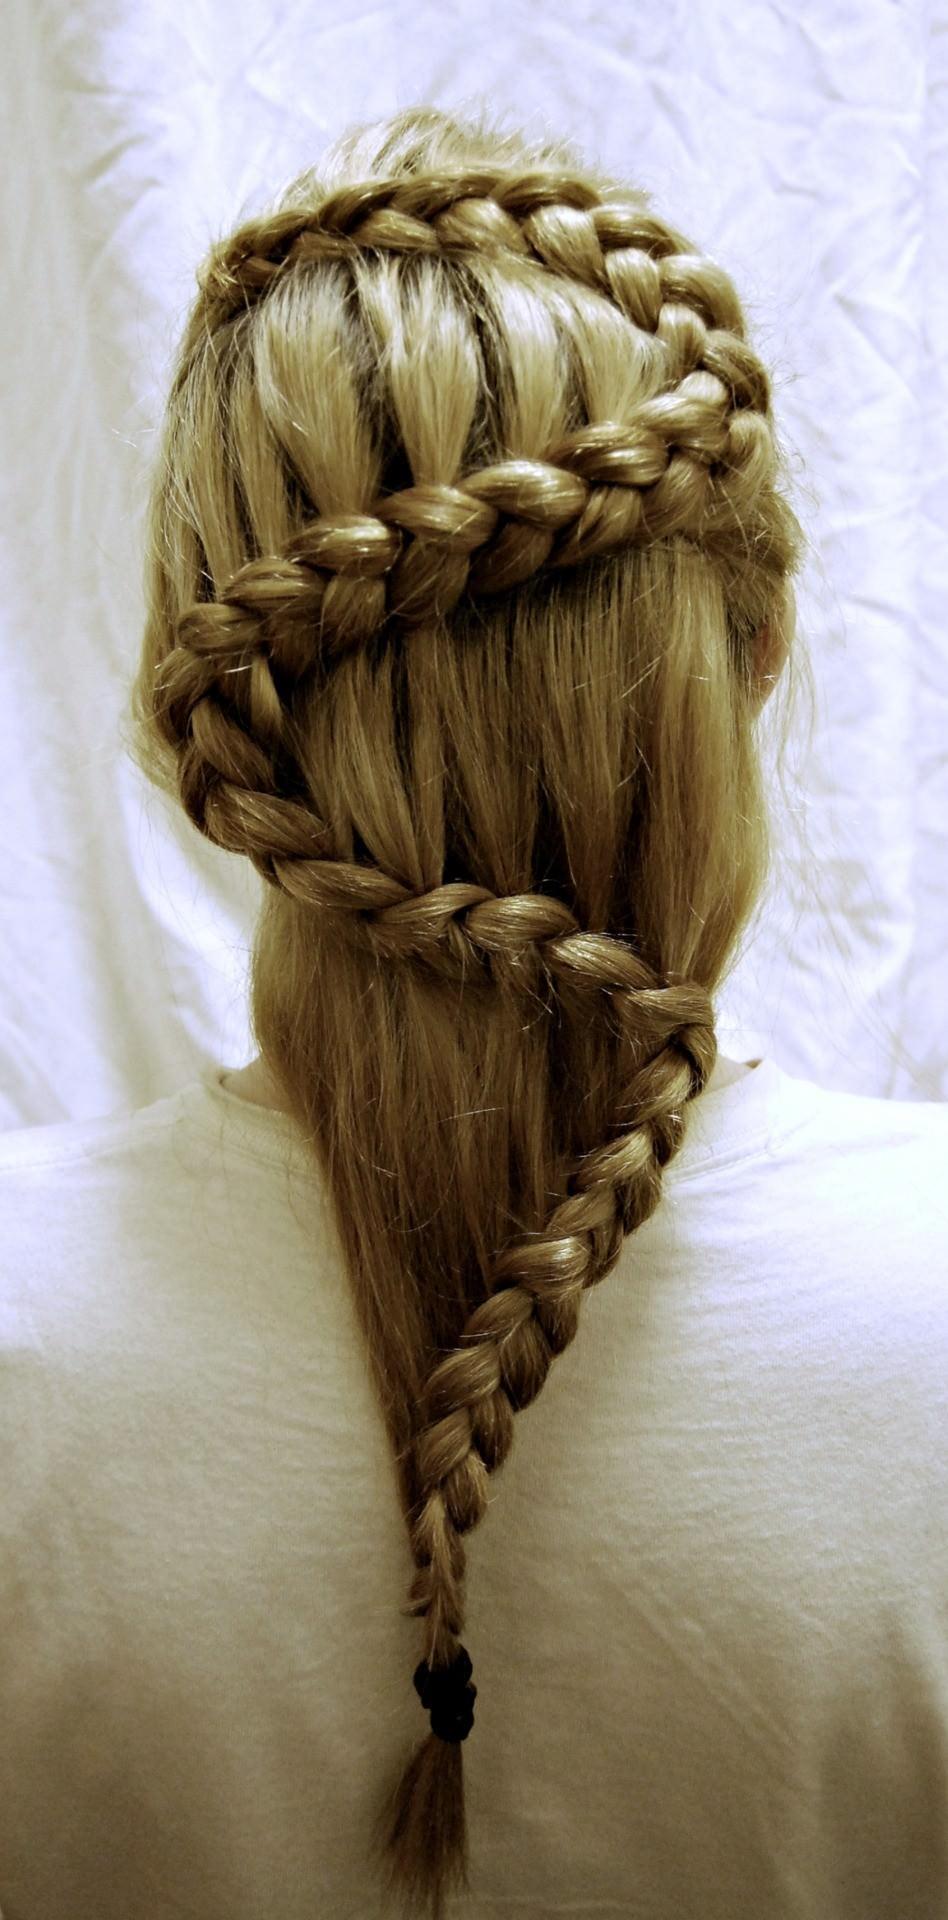 24 Long Braids Haircut Ideas Designs  Hairstyles  Design Trends  Premium PSD Vector Downloads